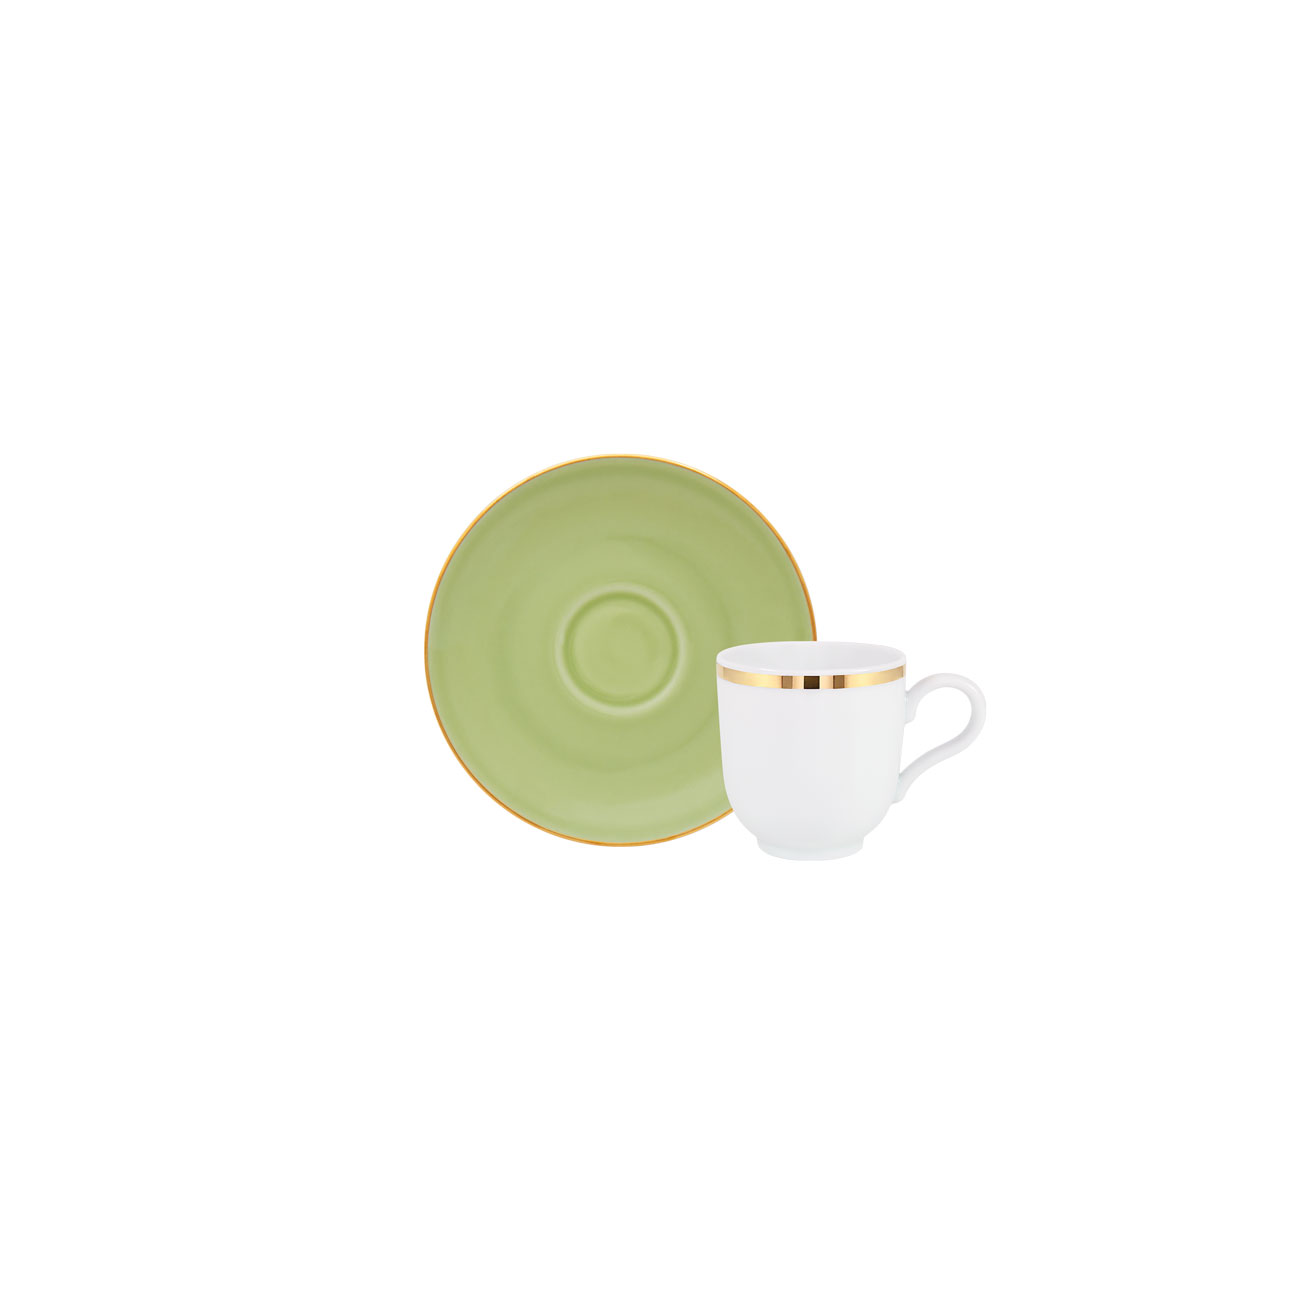 Golden | Chávena Café 10cl Antar + Matcha | Pires Café 12cm Olympus 0